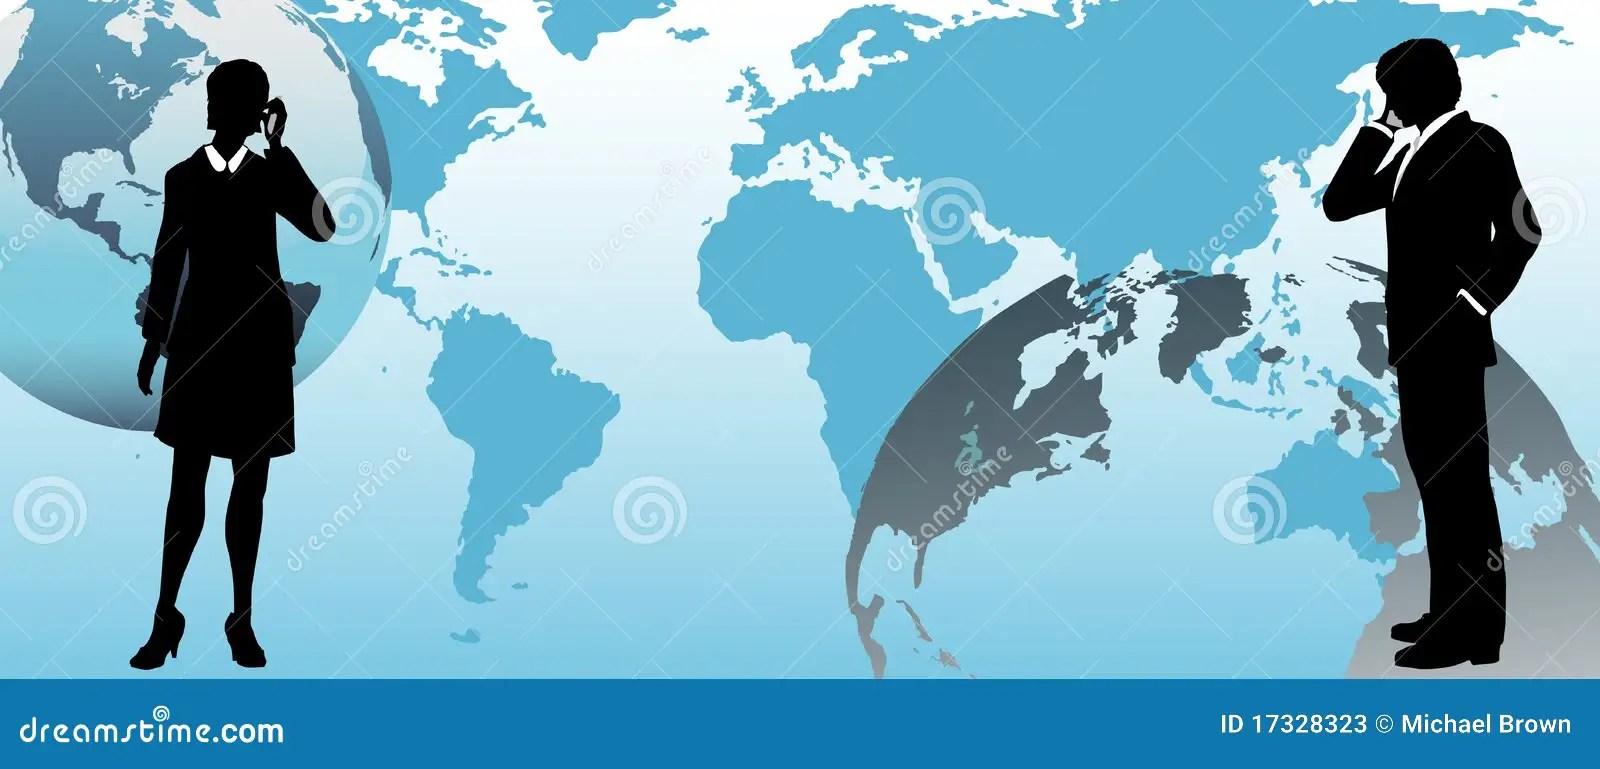 3d Virus Wallpaper Global Business People Communicate Across World Stock